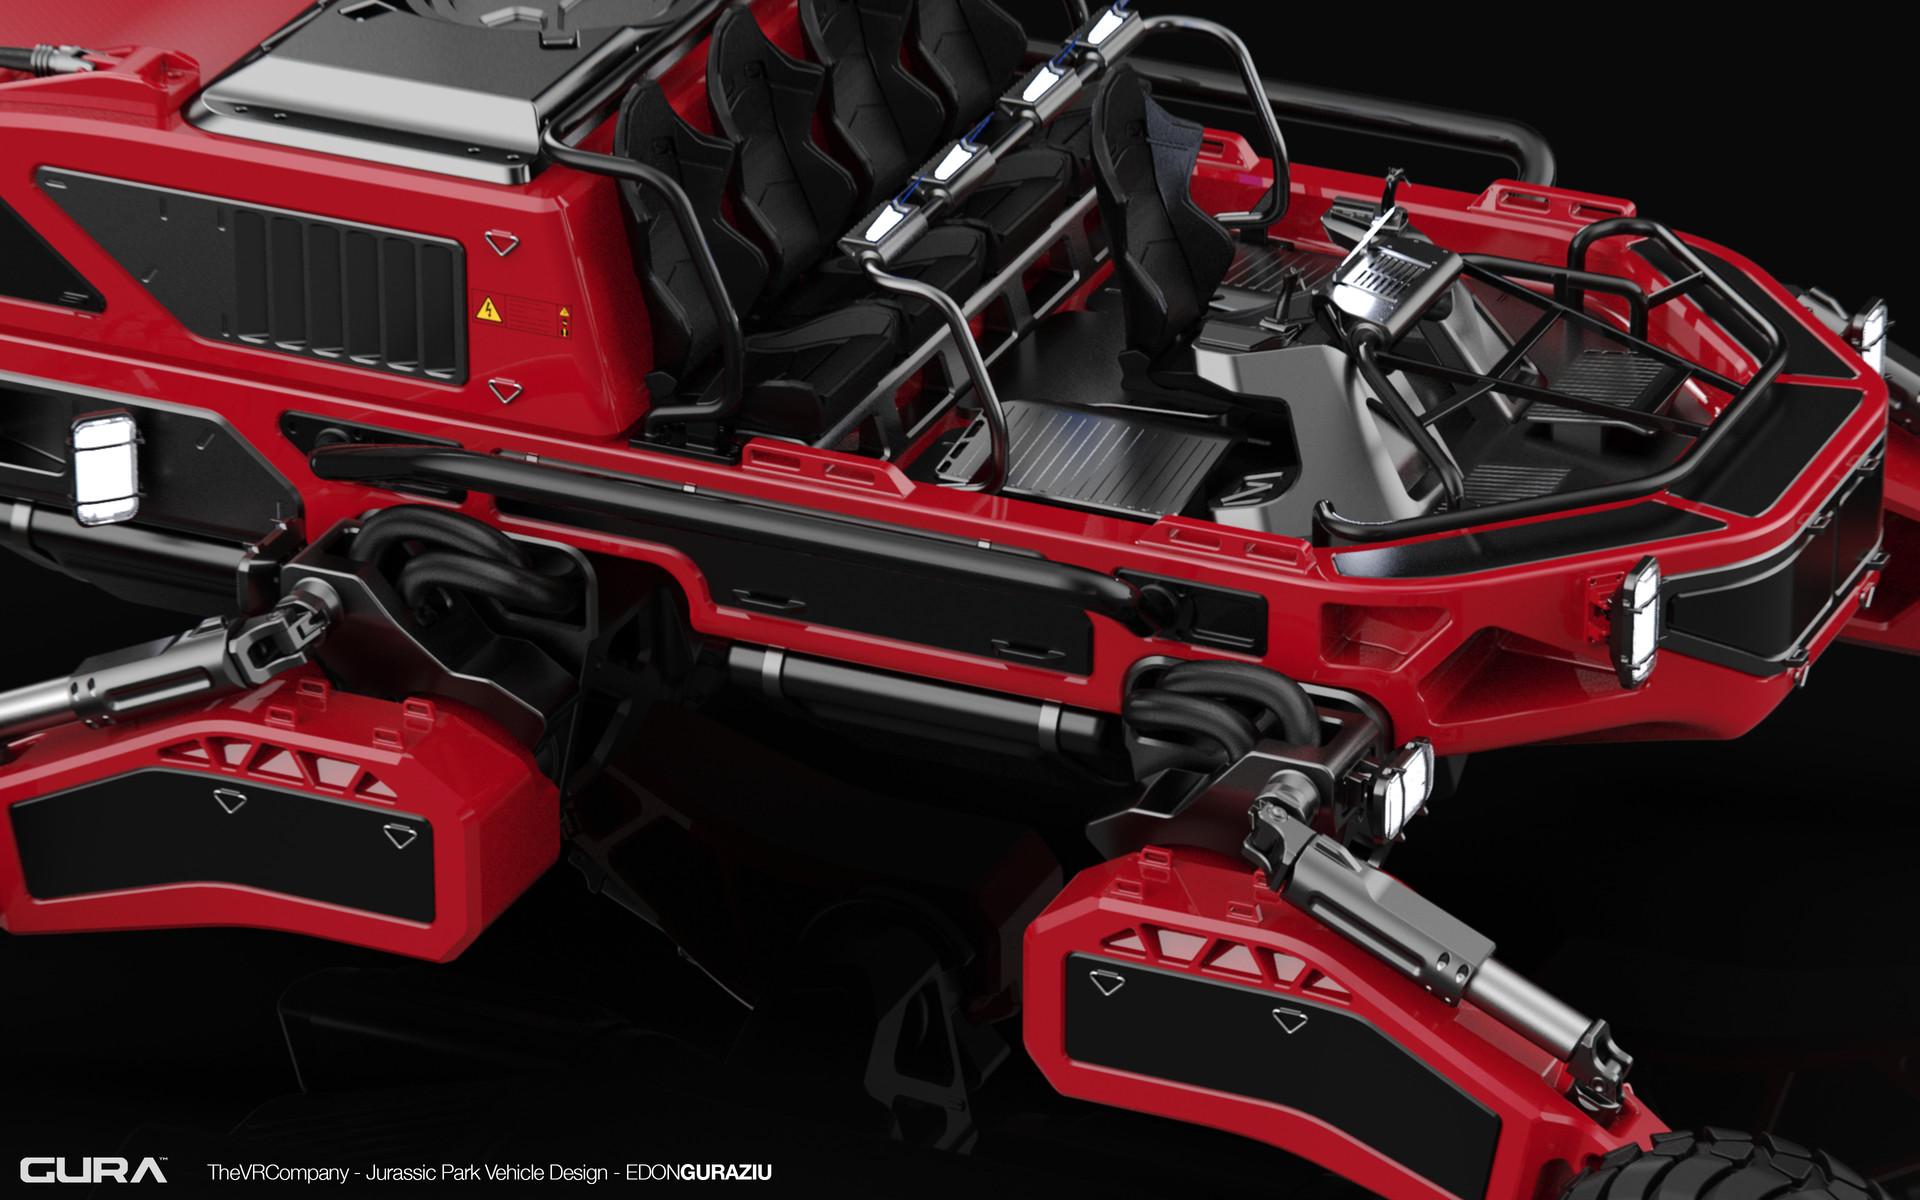 Edon guraziu vr vehicle design closeup